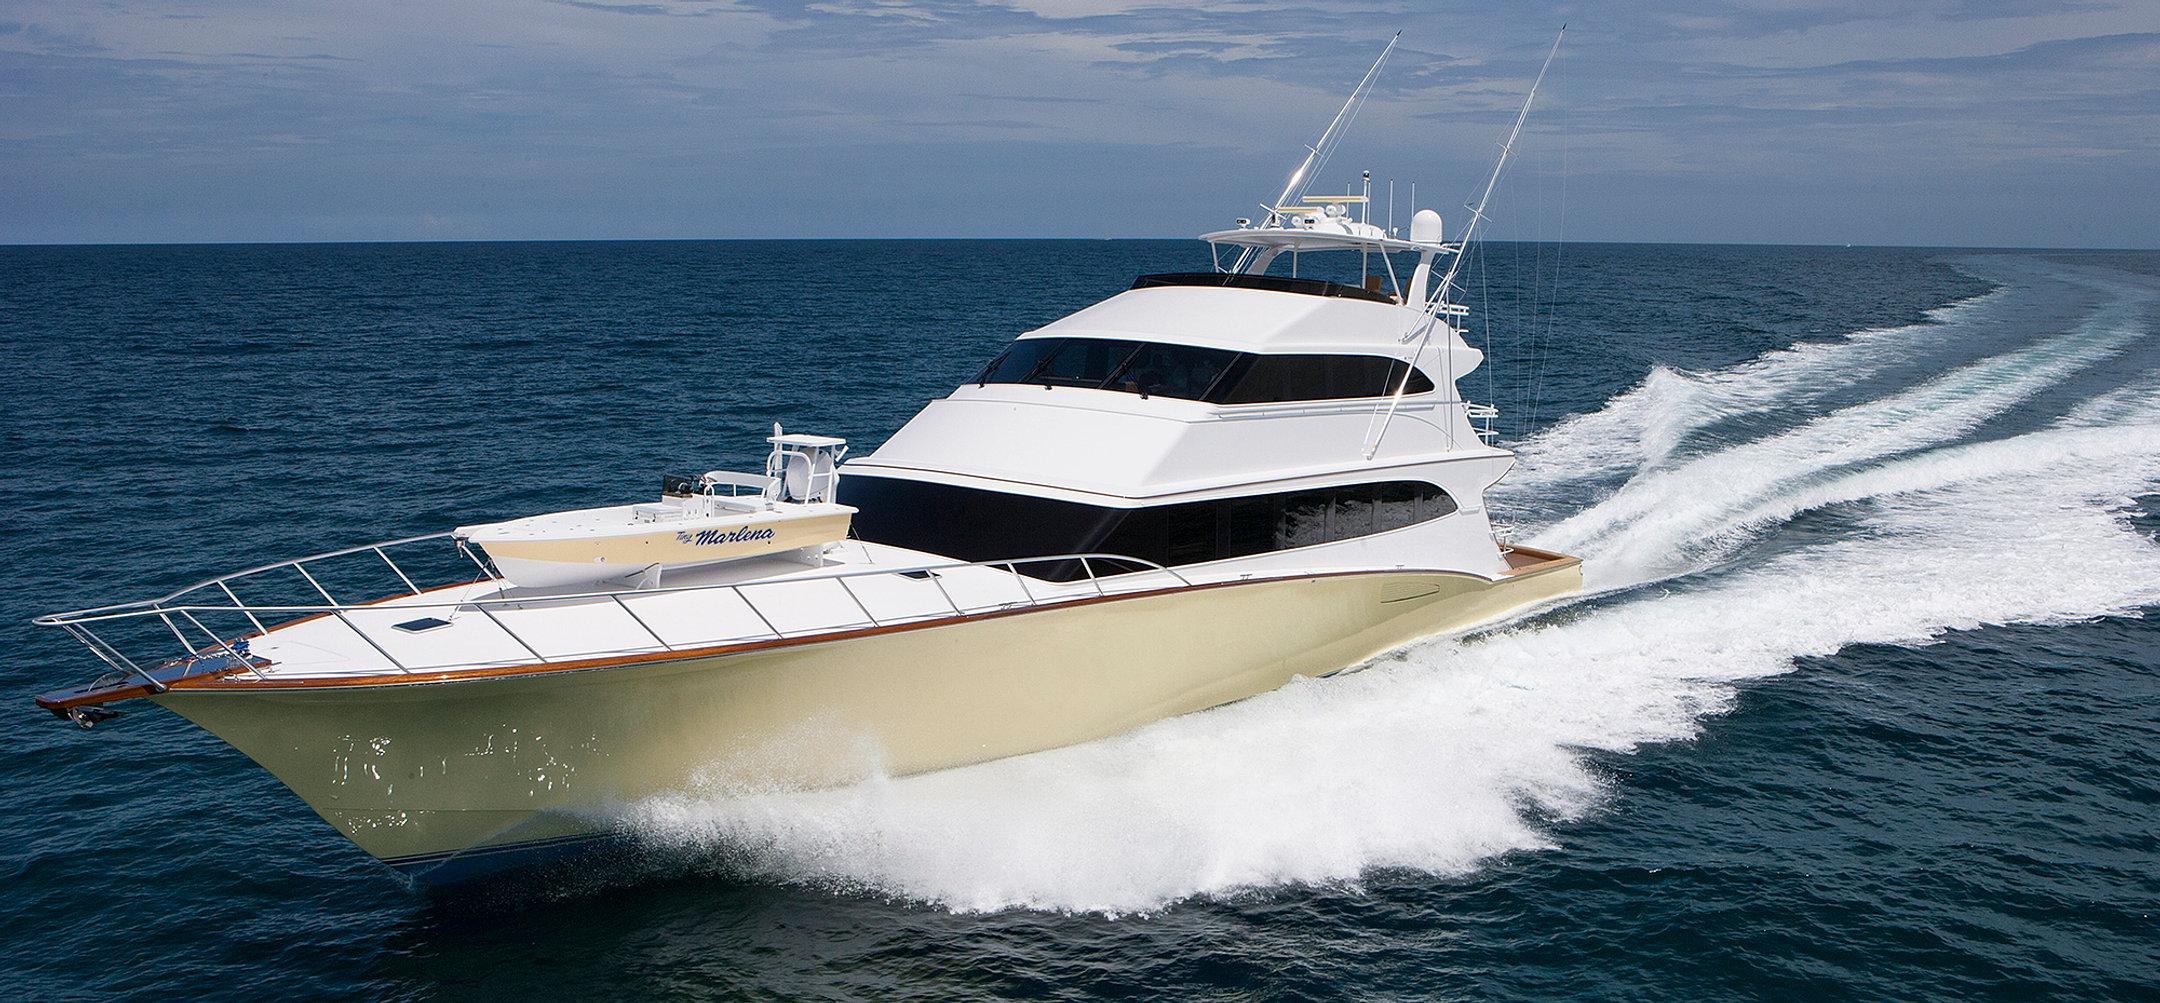 Jim Smith Tournament Boats   Custom Fishing Boats   Florida   Jim Smith 105 Marlena